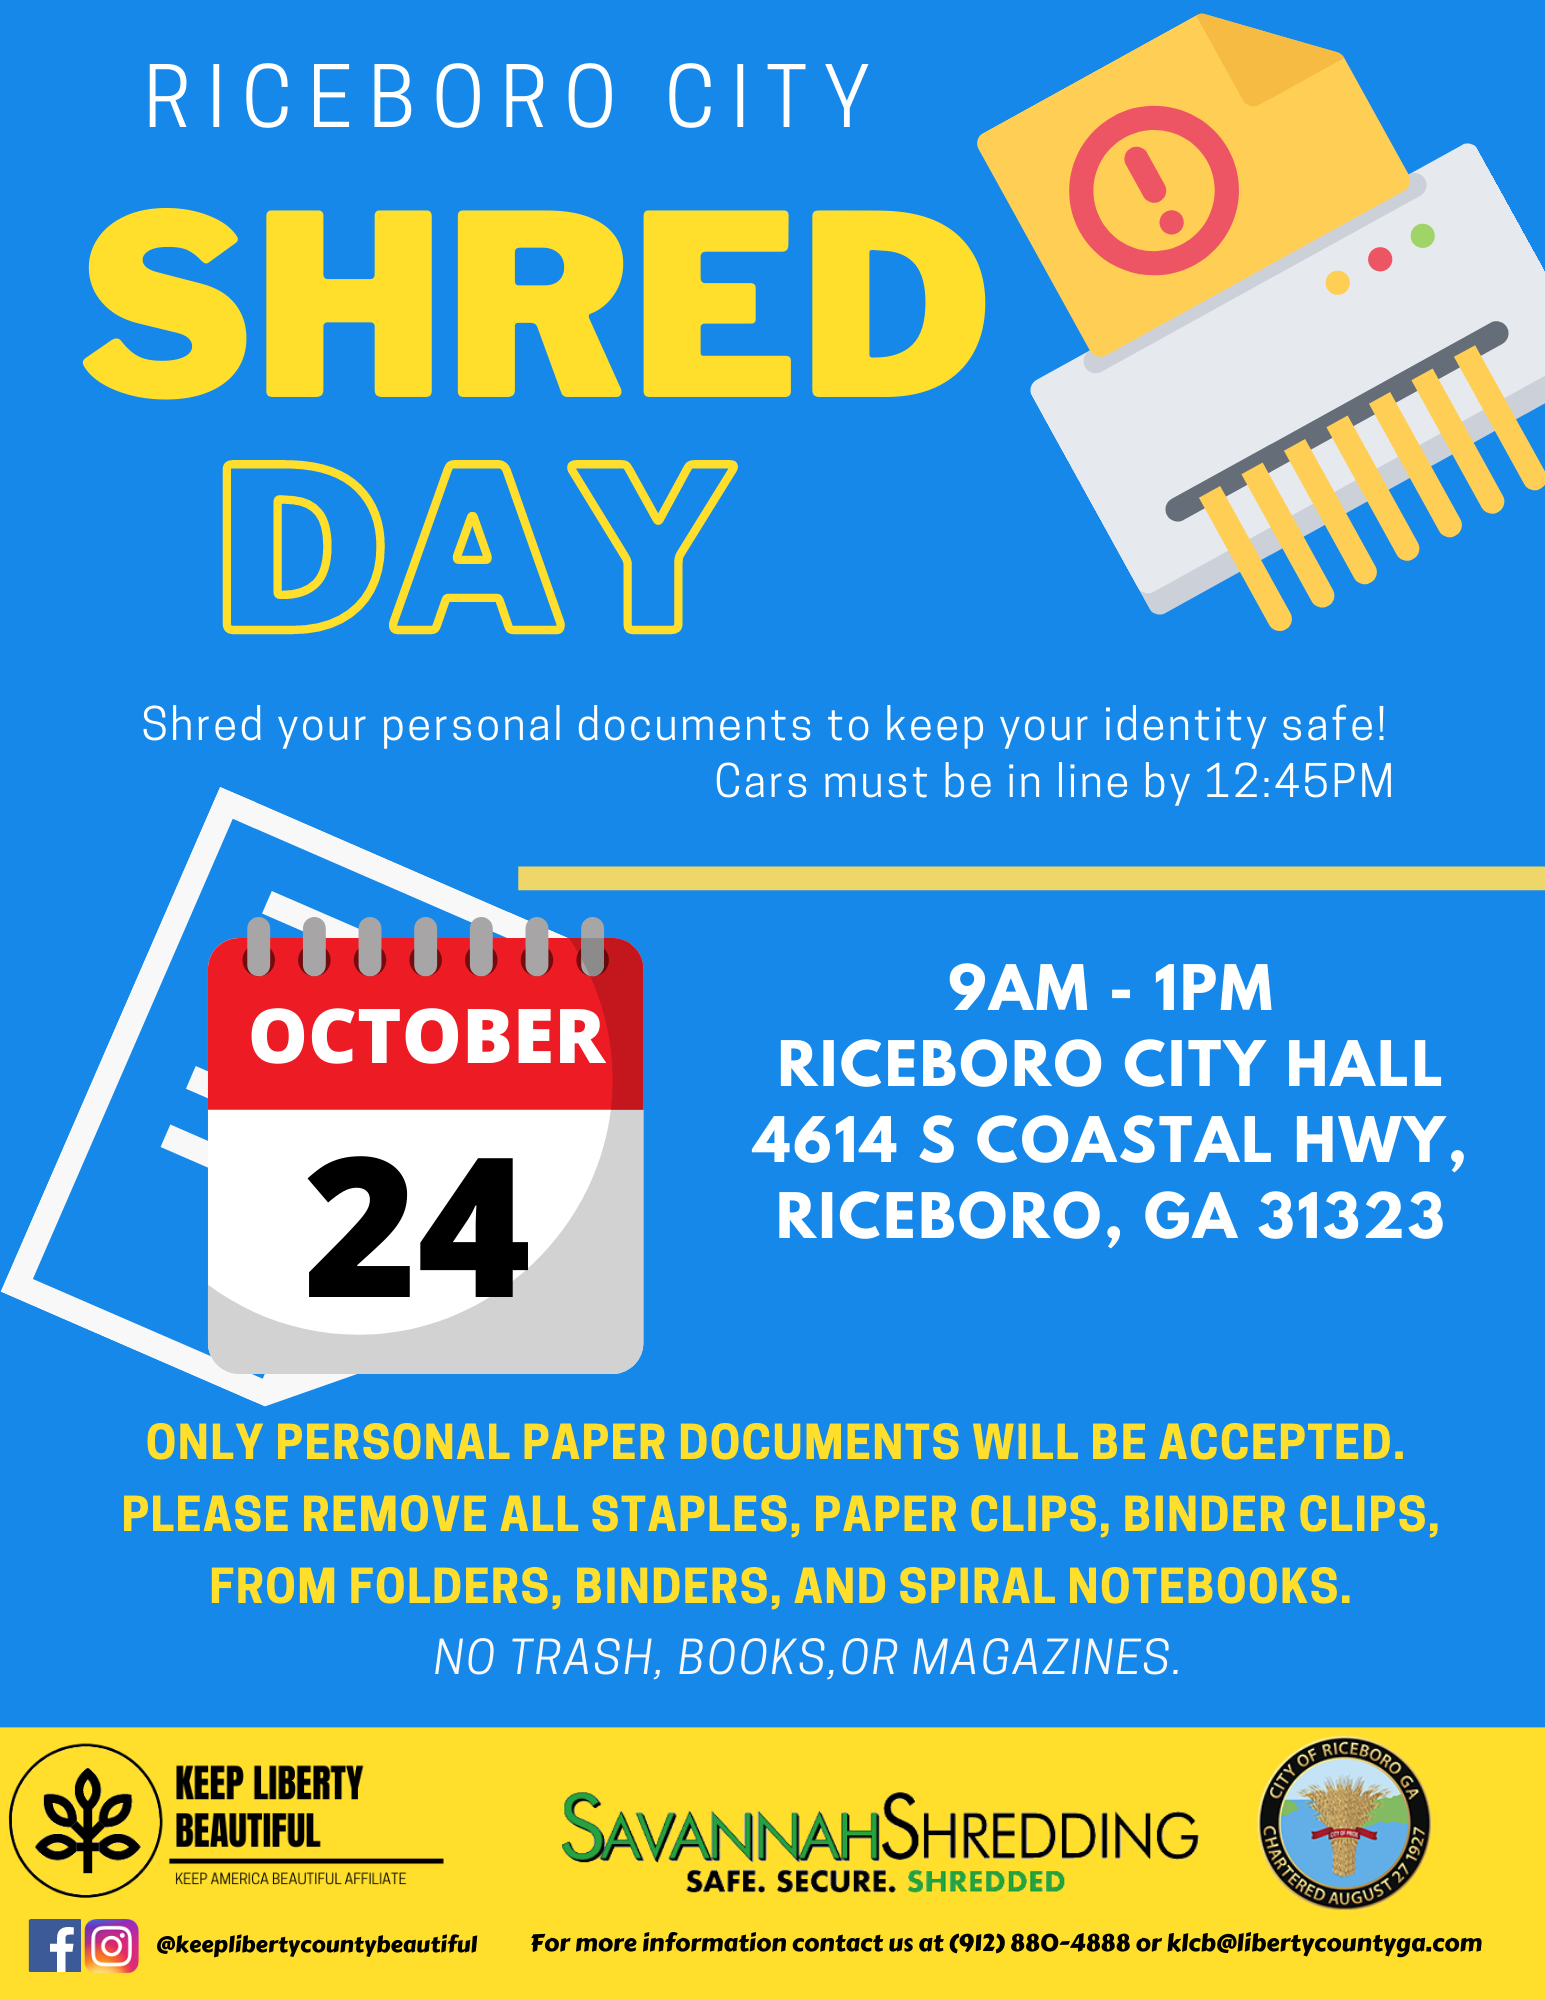 Riceboro shred day